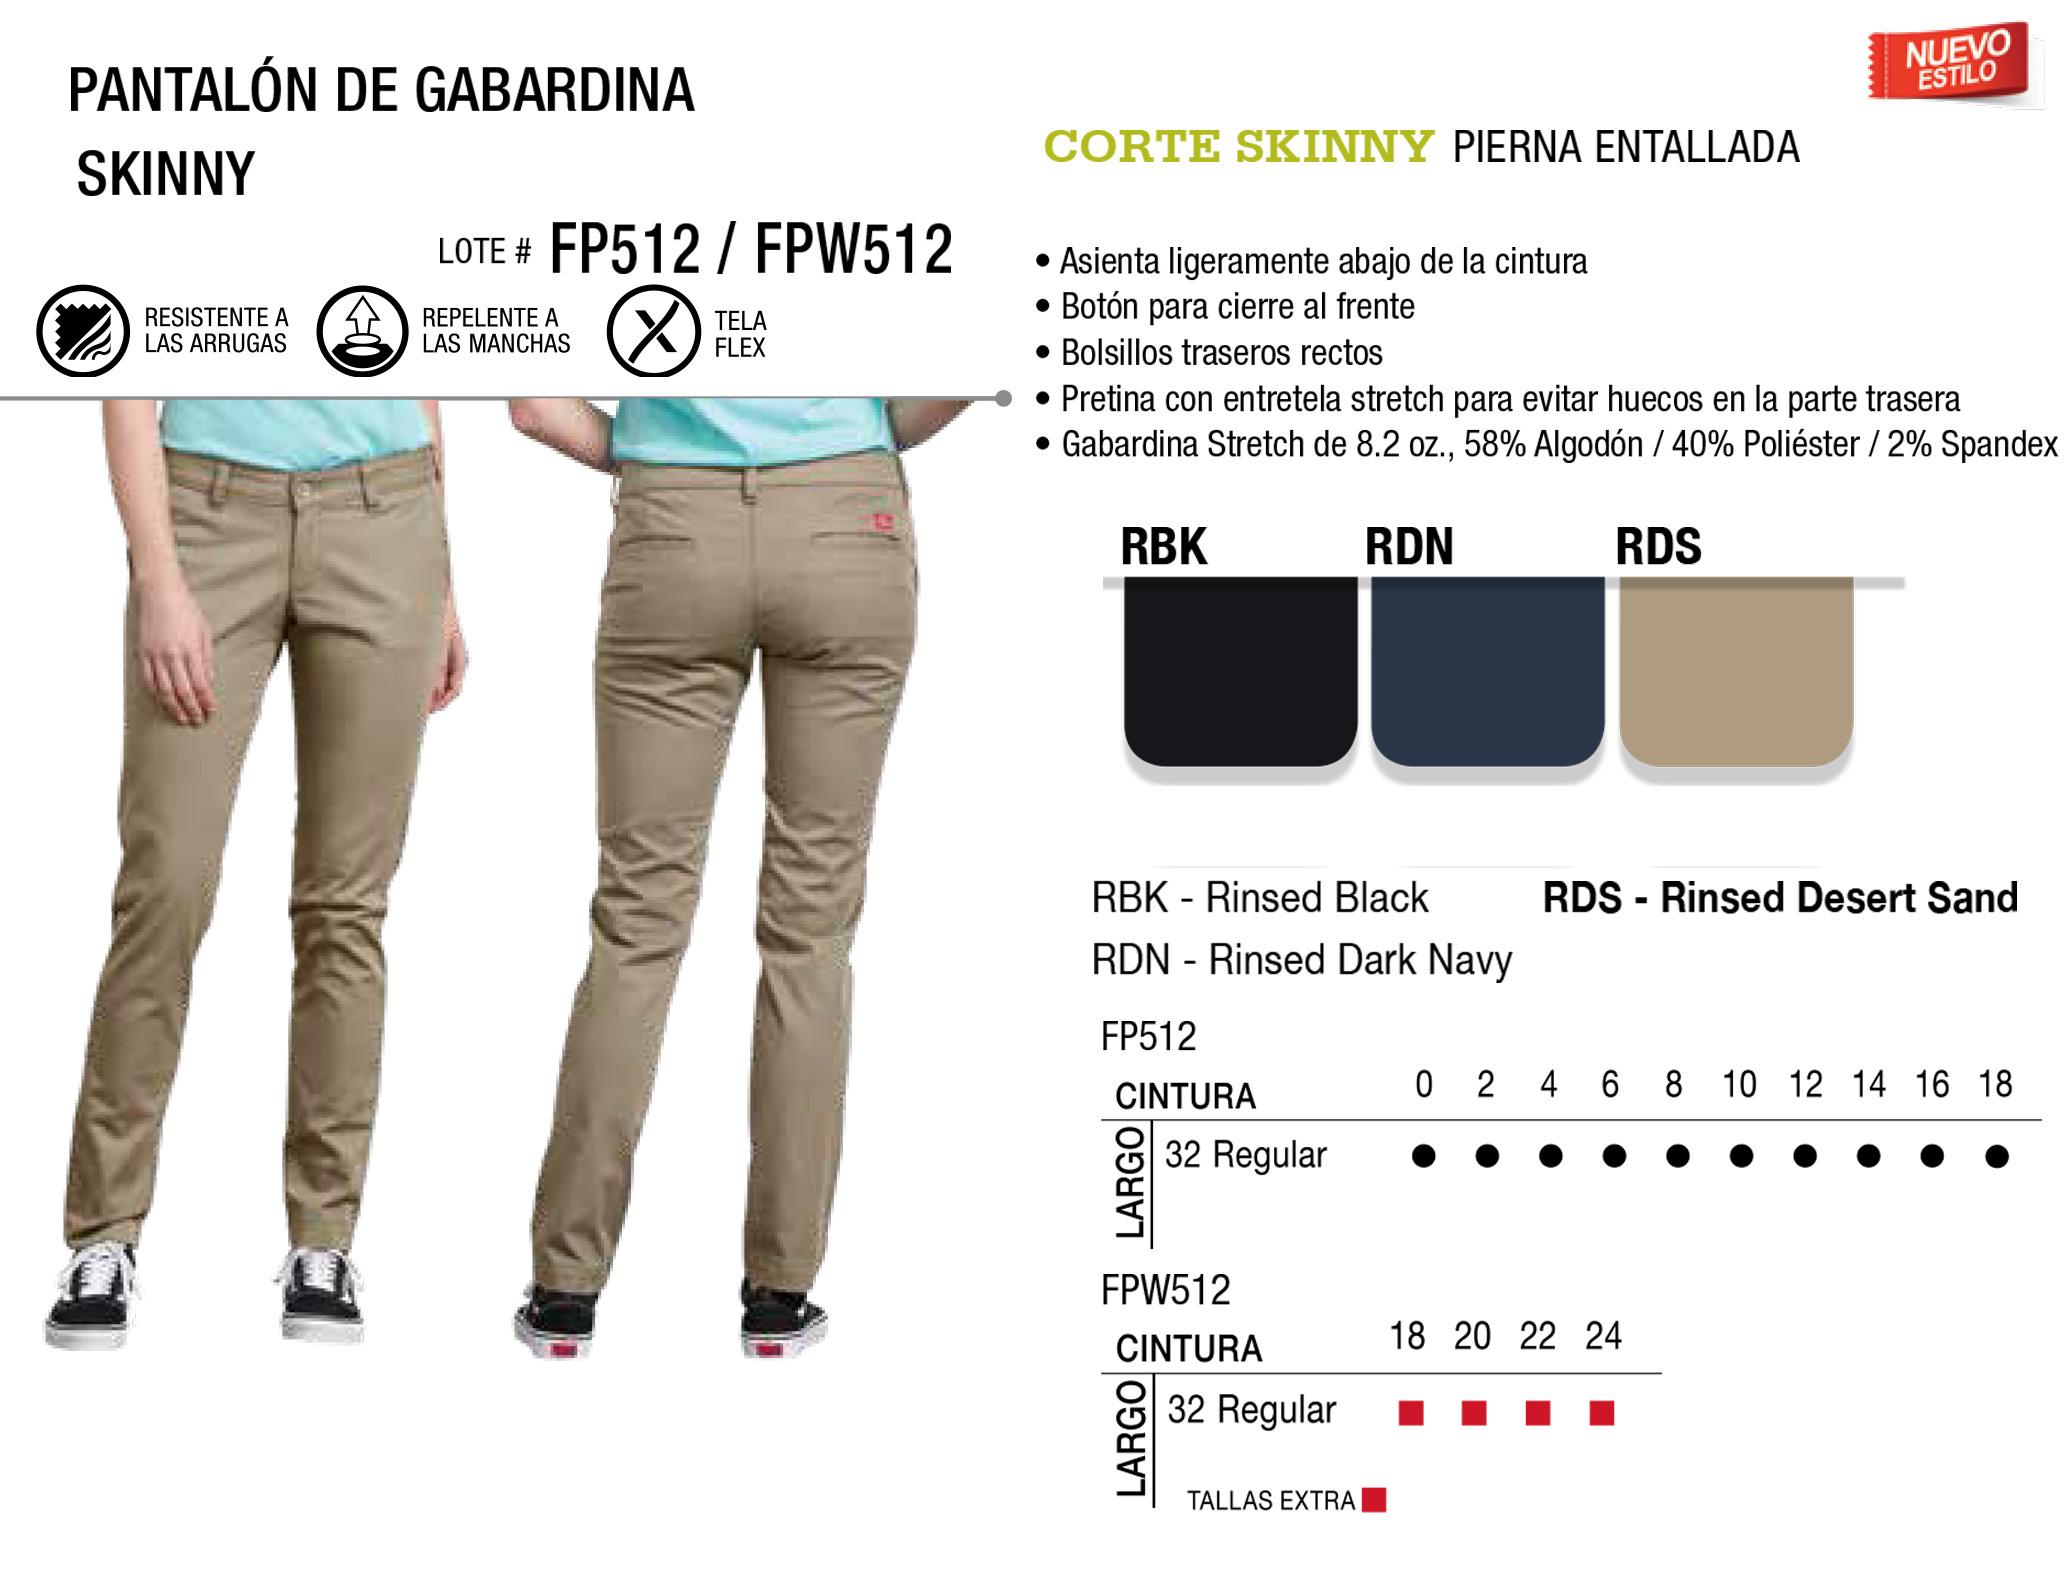 Pantalón de Gabardina Skinny. Corte Skinny. FP512/FPW512.